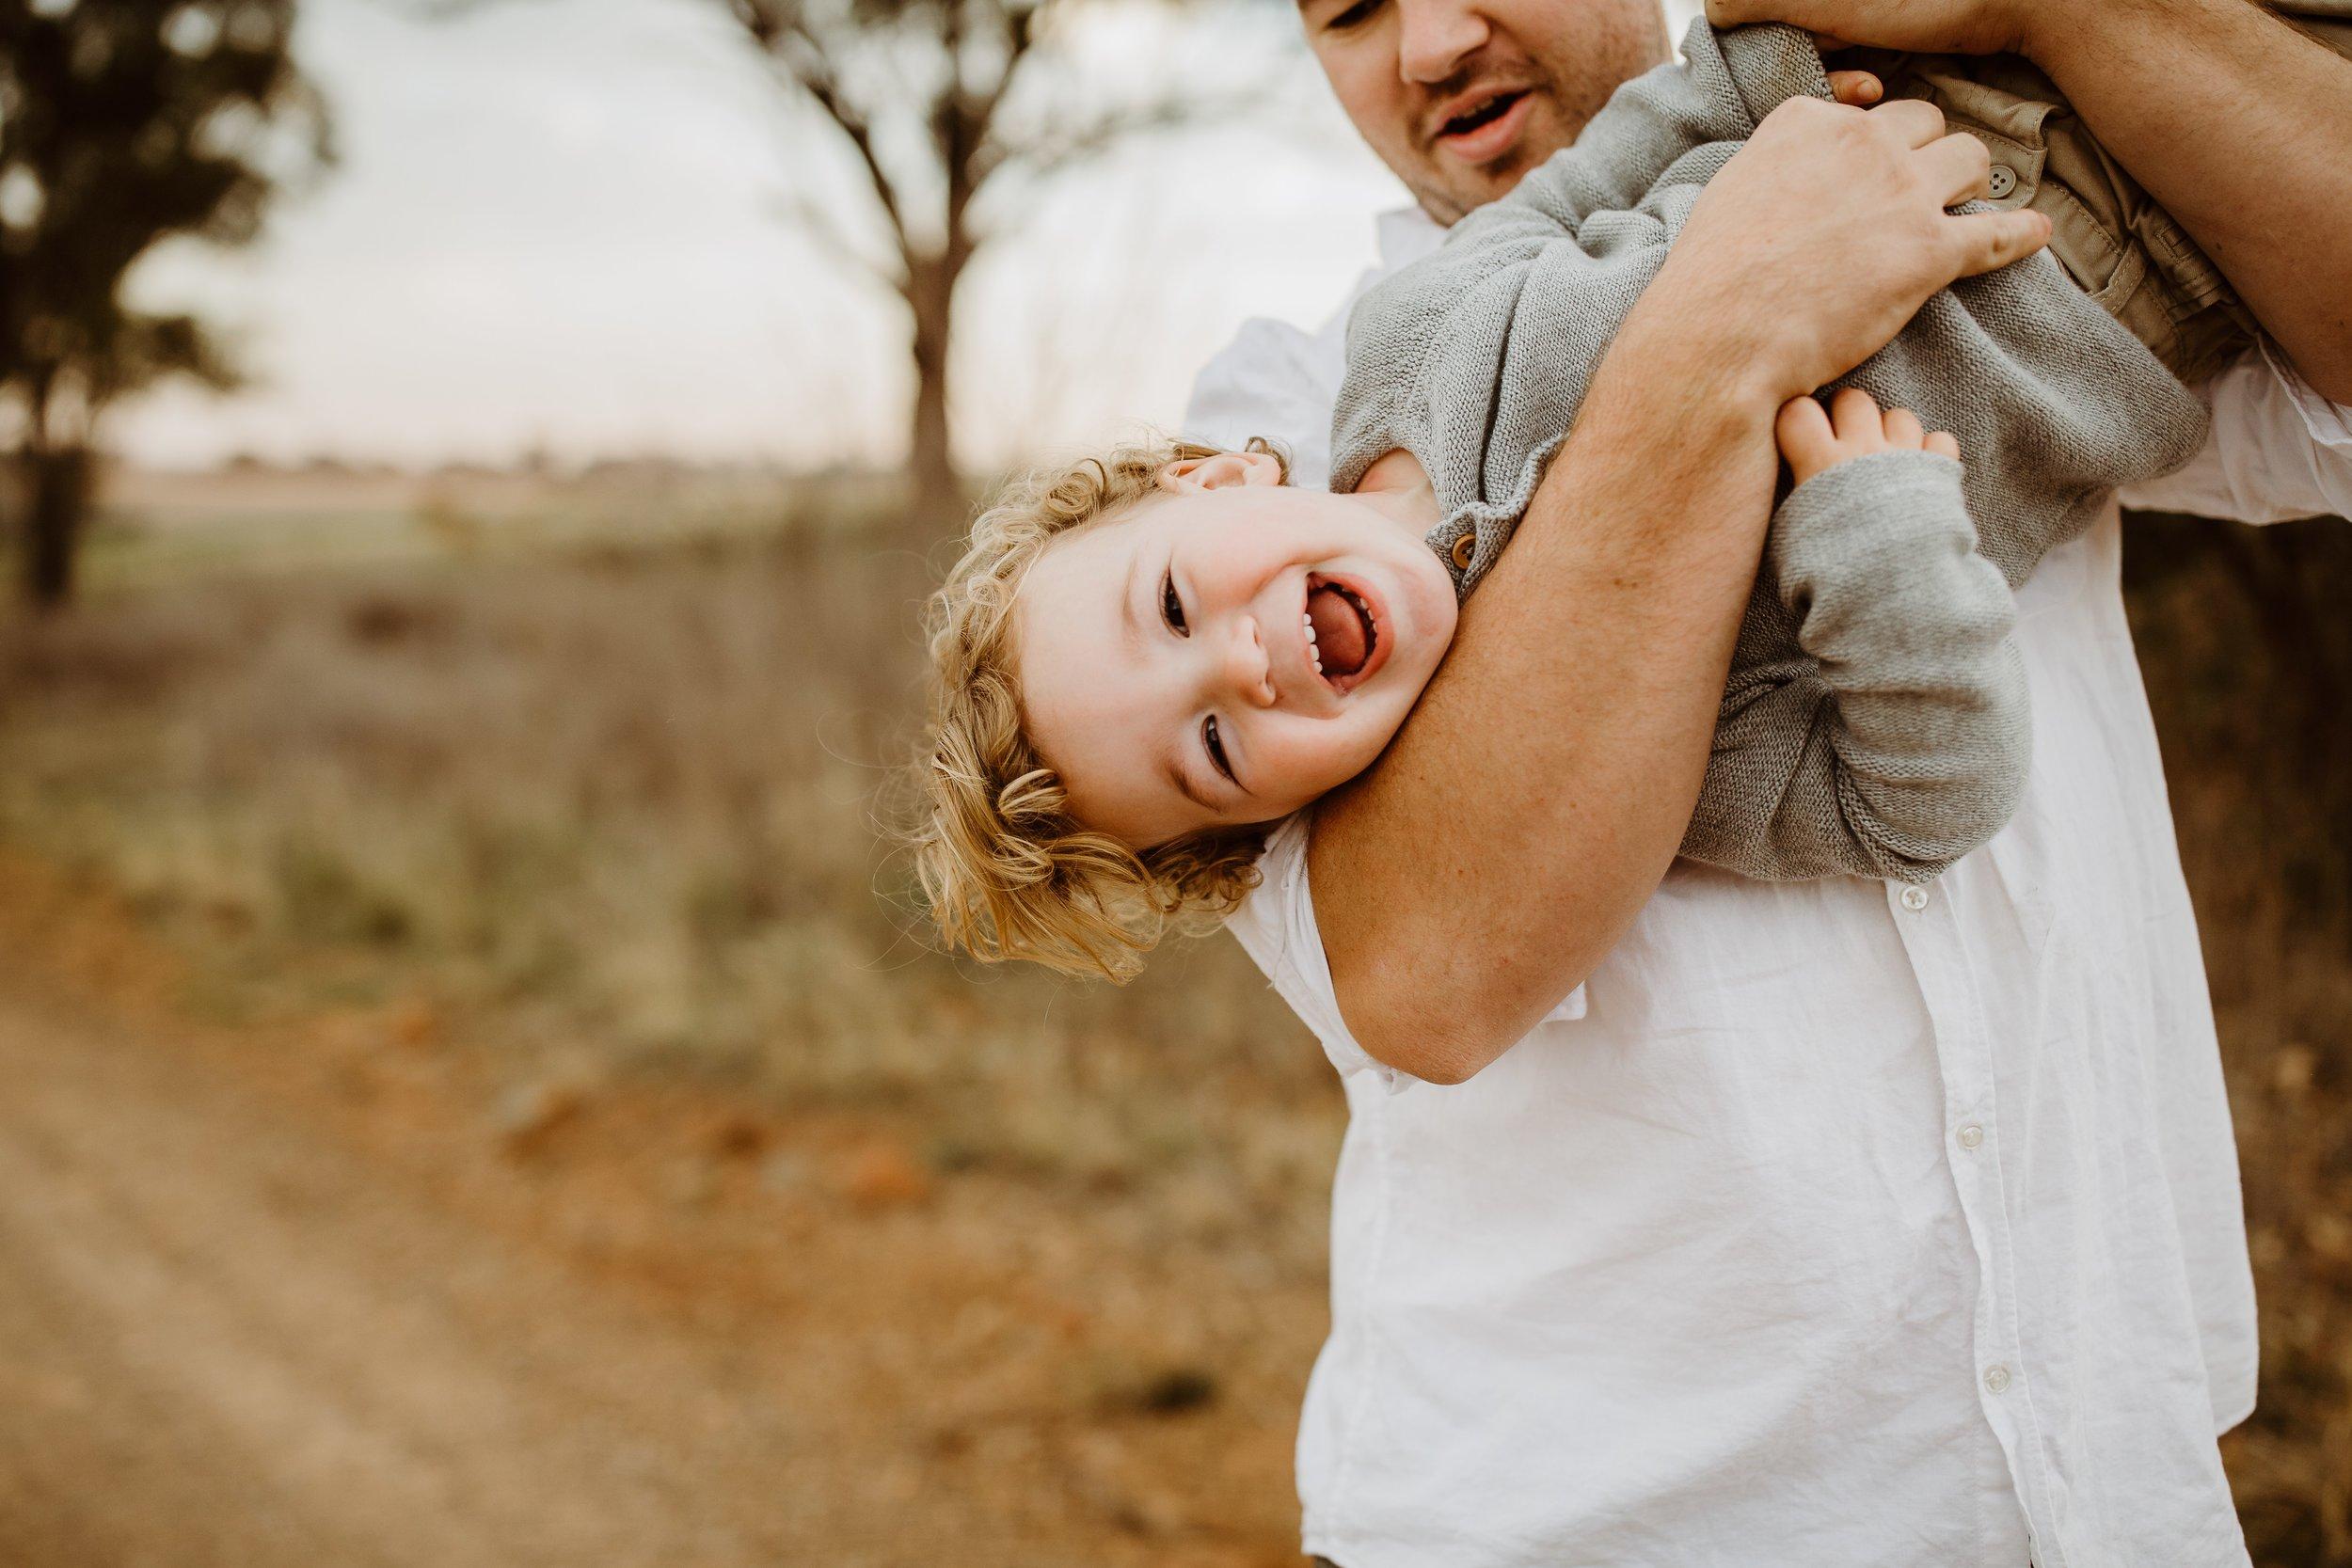 mickalathomas_puremacphotography_weddingphotographer_couplephotographer_Sheppartonphotographer_1616.jpg